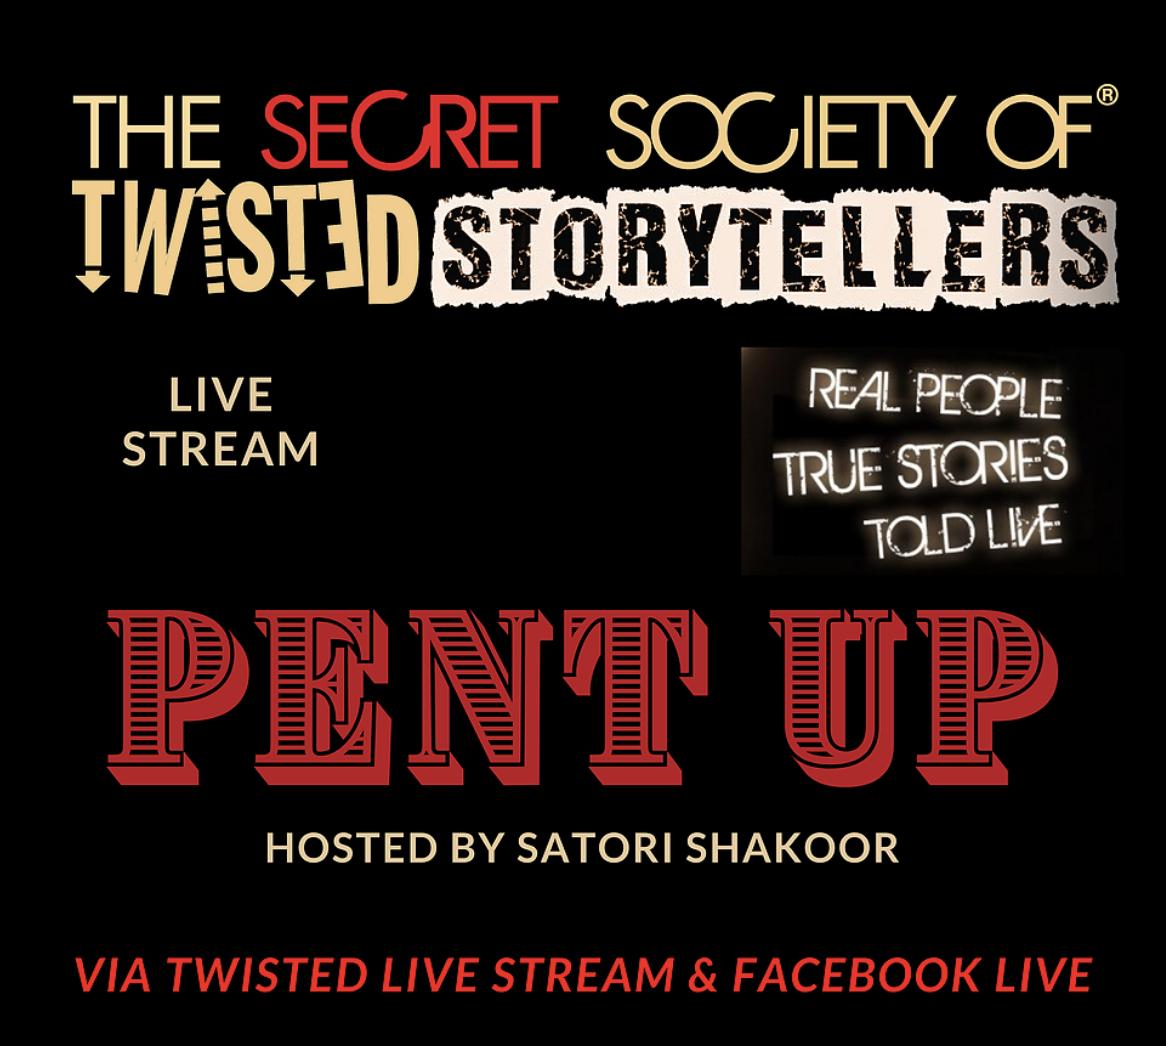 The Secret Society ~ Pent Up